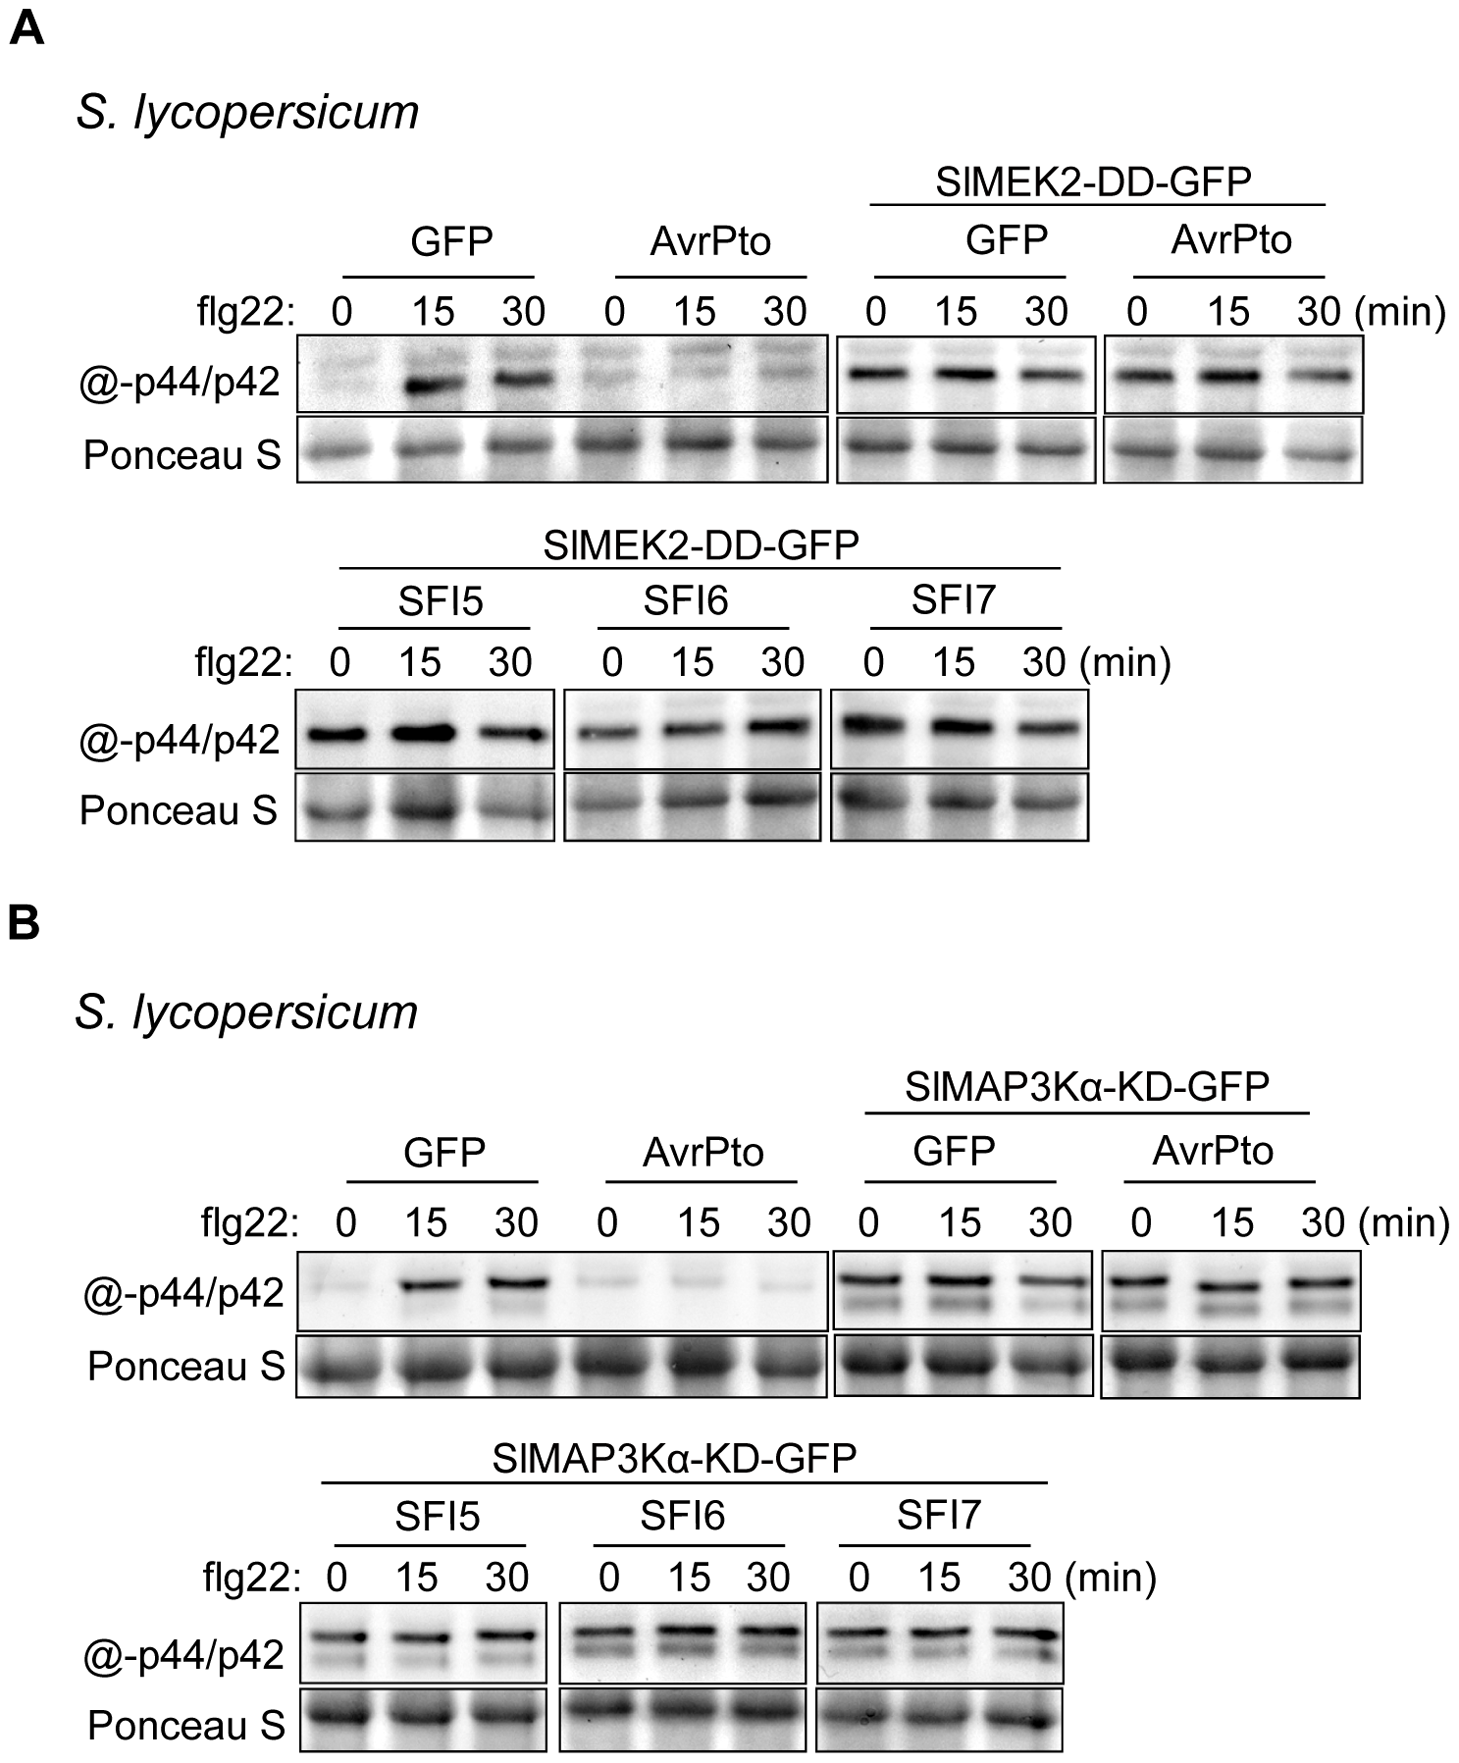 Epistatic analysis of MAP kinase activation upon flg22 treatment in <i>S. lycopersicum</i> protoplasts expressing SFI effector genes.